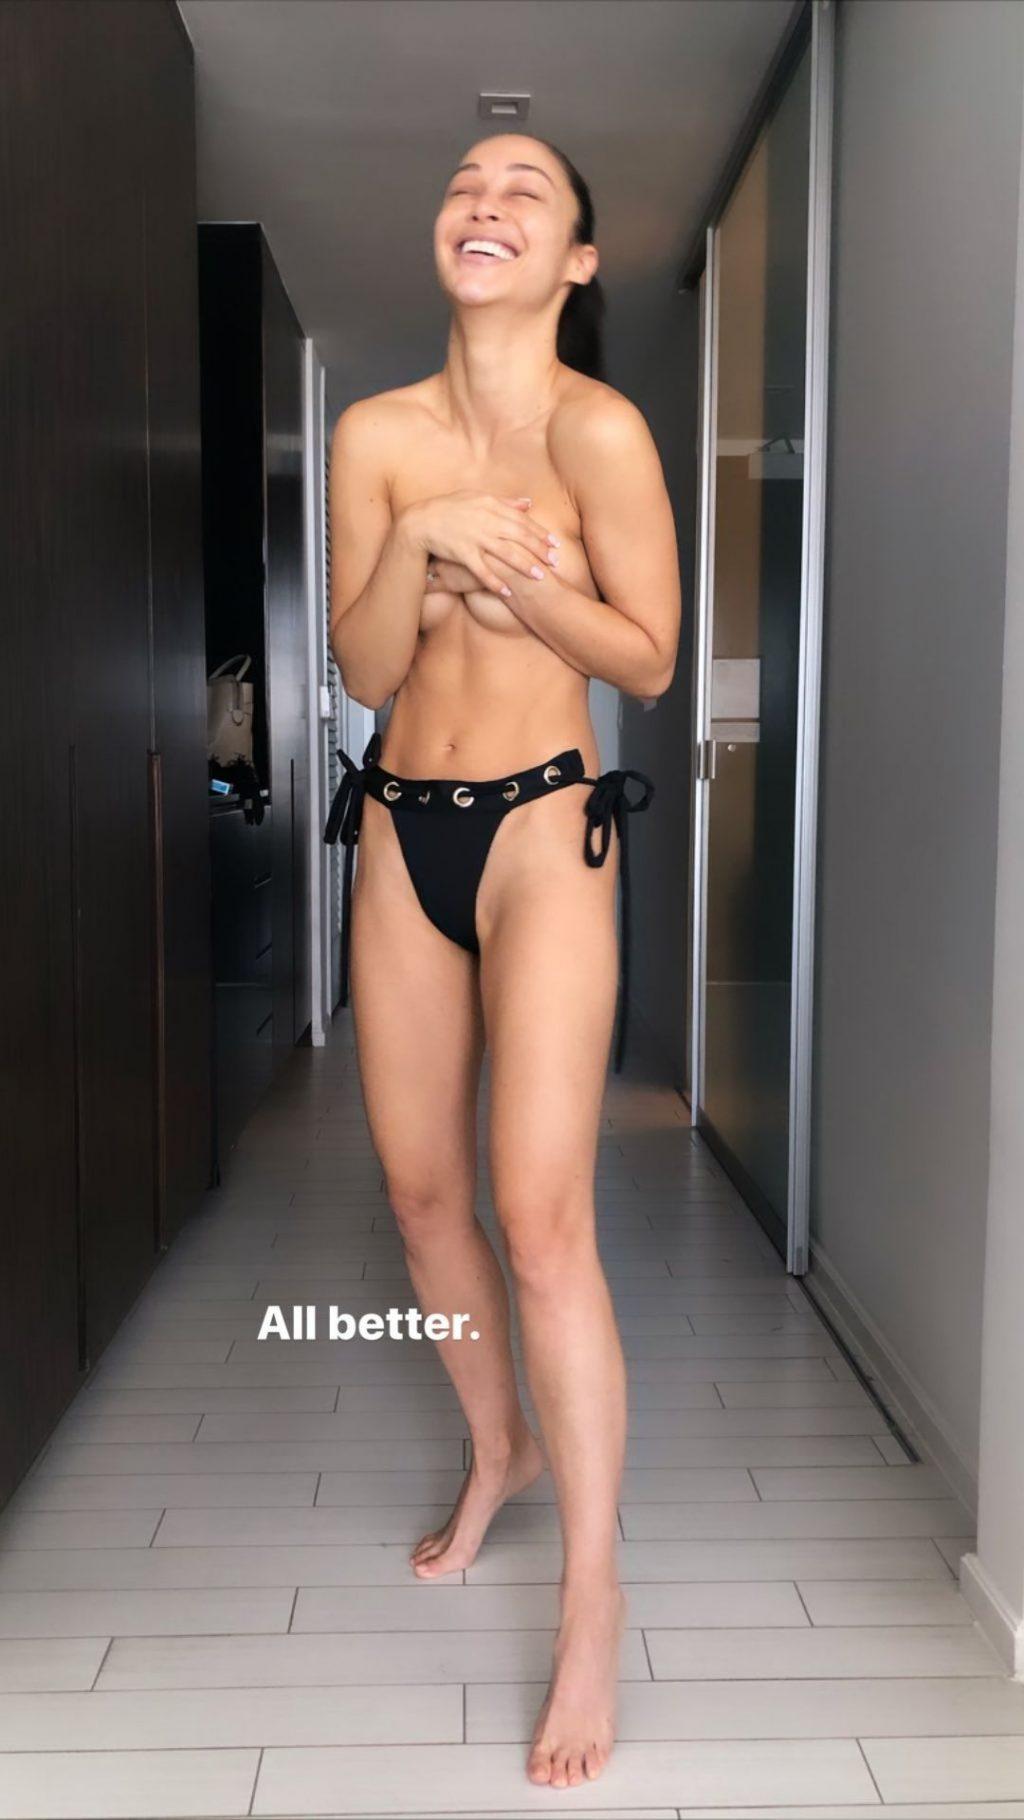 Cara Santana in Bikini (+ Bonus Topless Pictures)